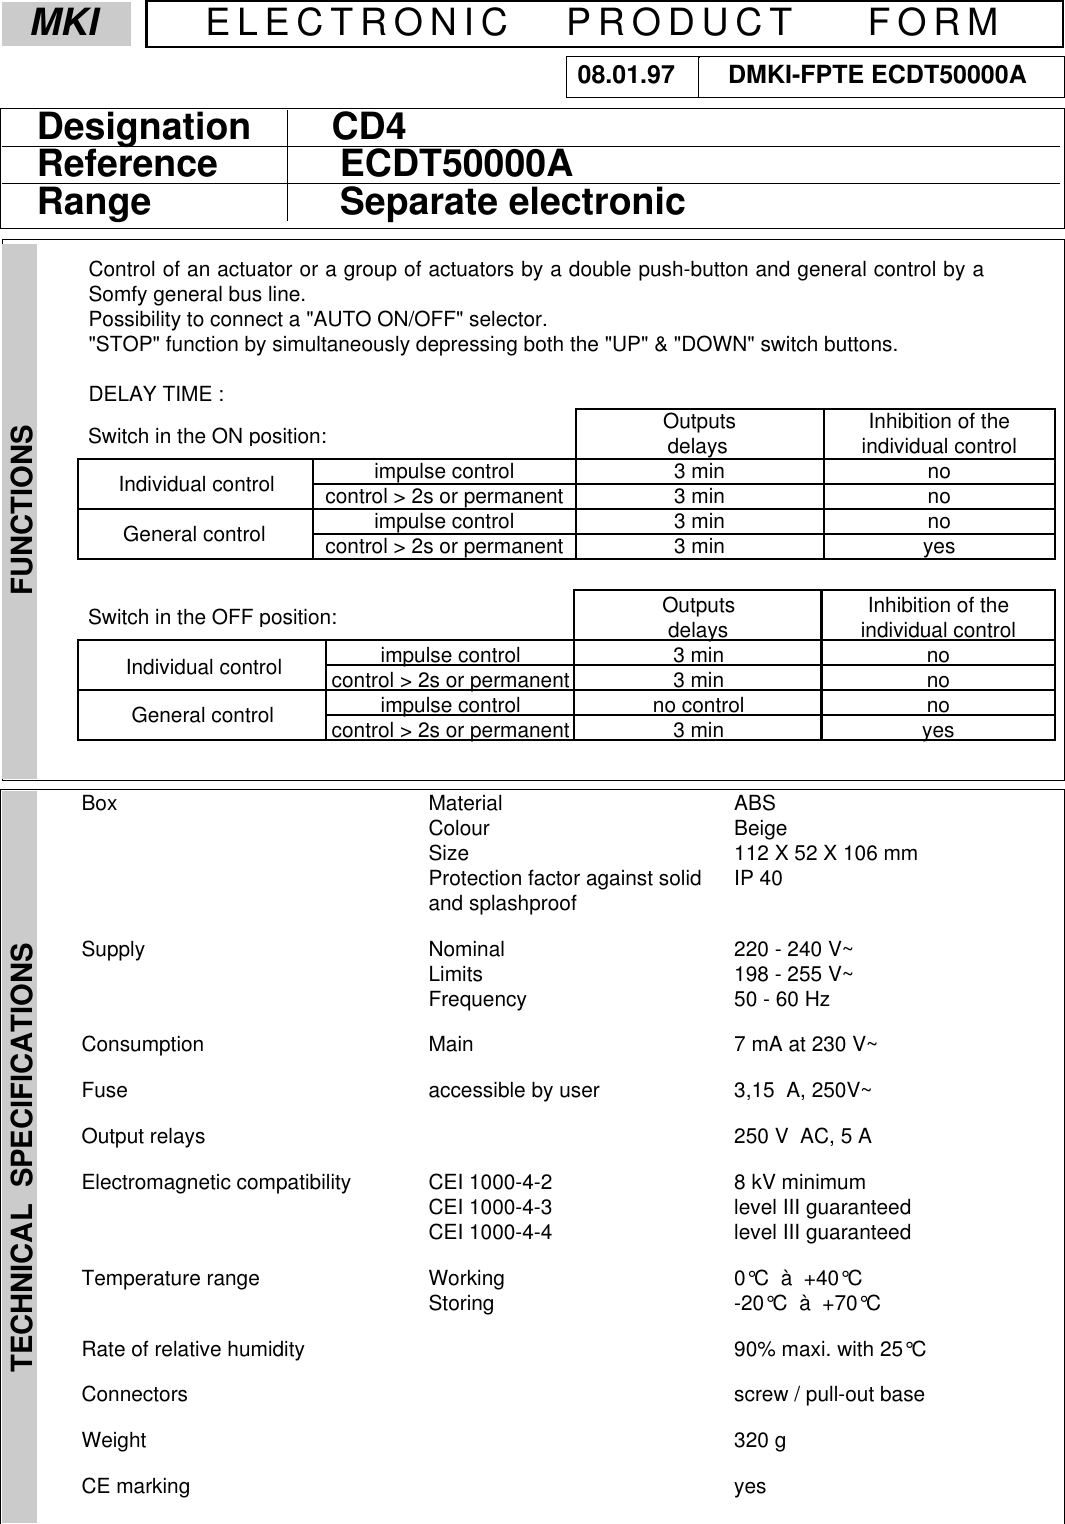 (PDF) A Validation Method of Computational Fluid Dynamics ...